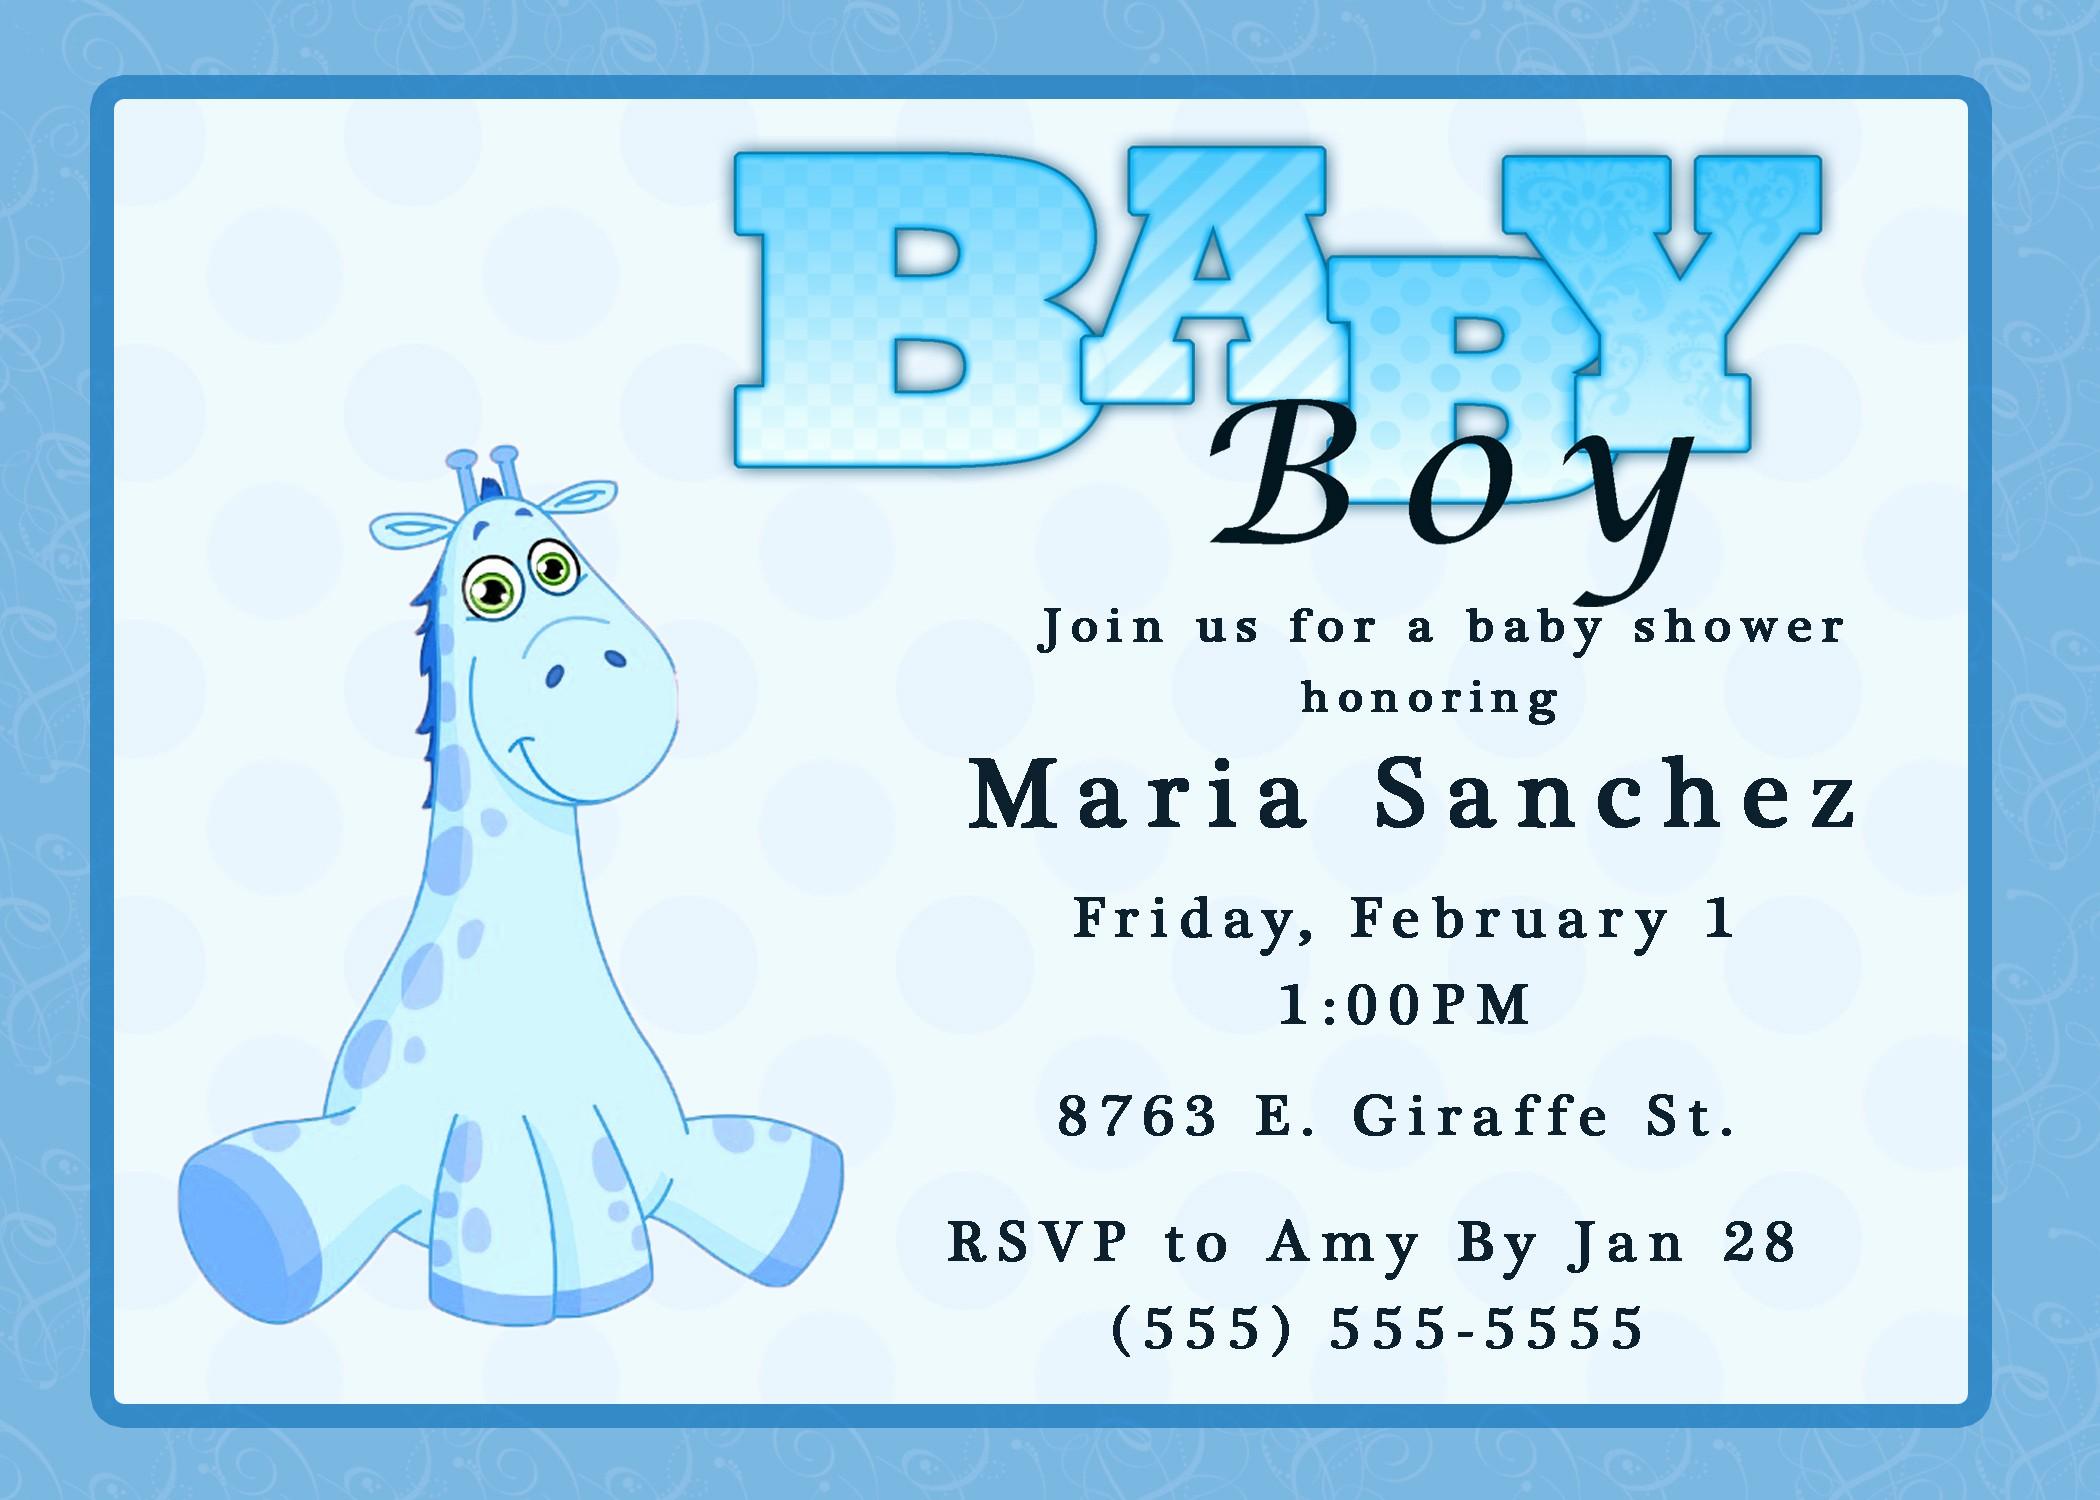 Baby Boy Announcements Free Templates Inspirational Free Baby Boy Shower Invitations Templates Baby Boy